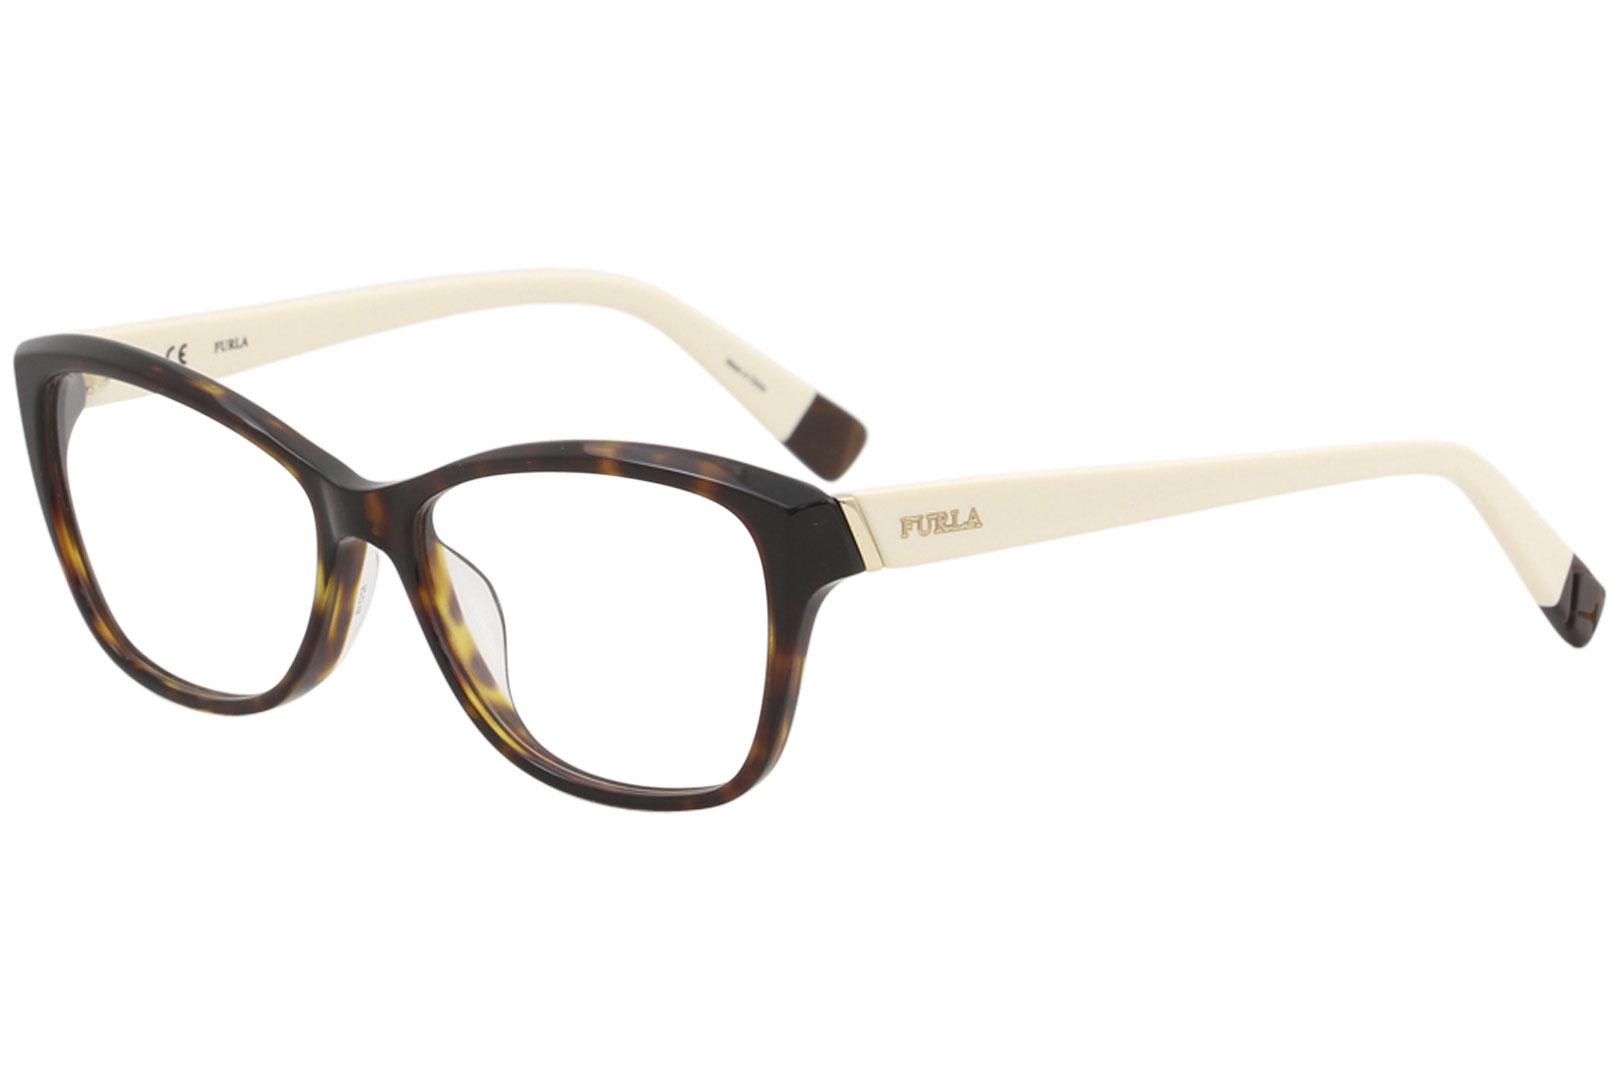 1e881ed5cac Furla Womens Eyeglasses VU4908 VU 4908 0779 Tortoise Full Rim ...